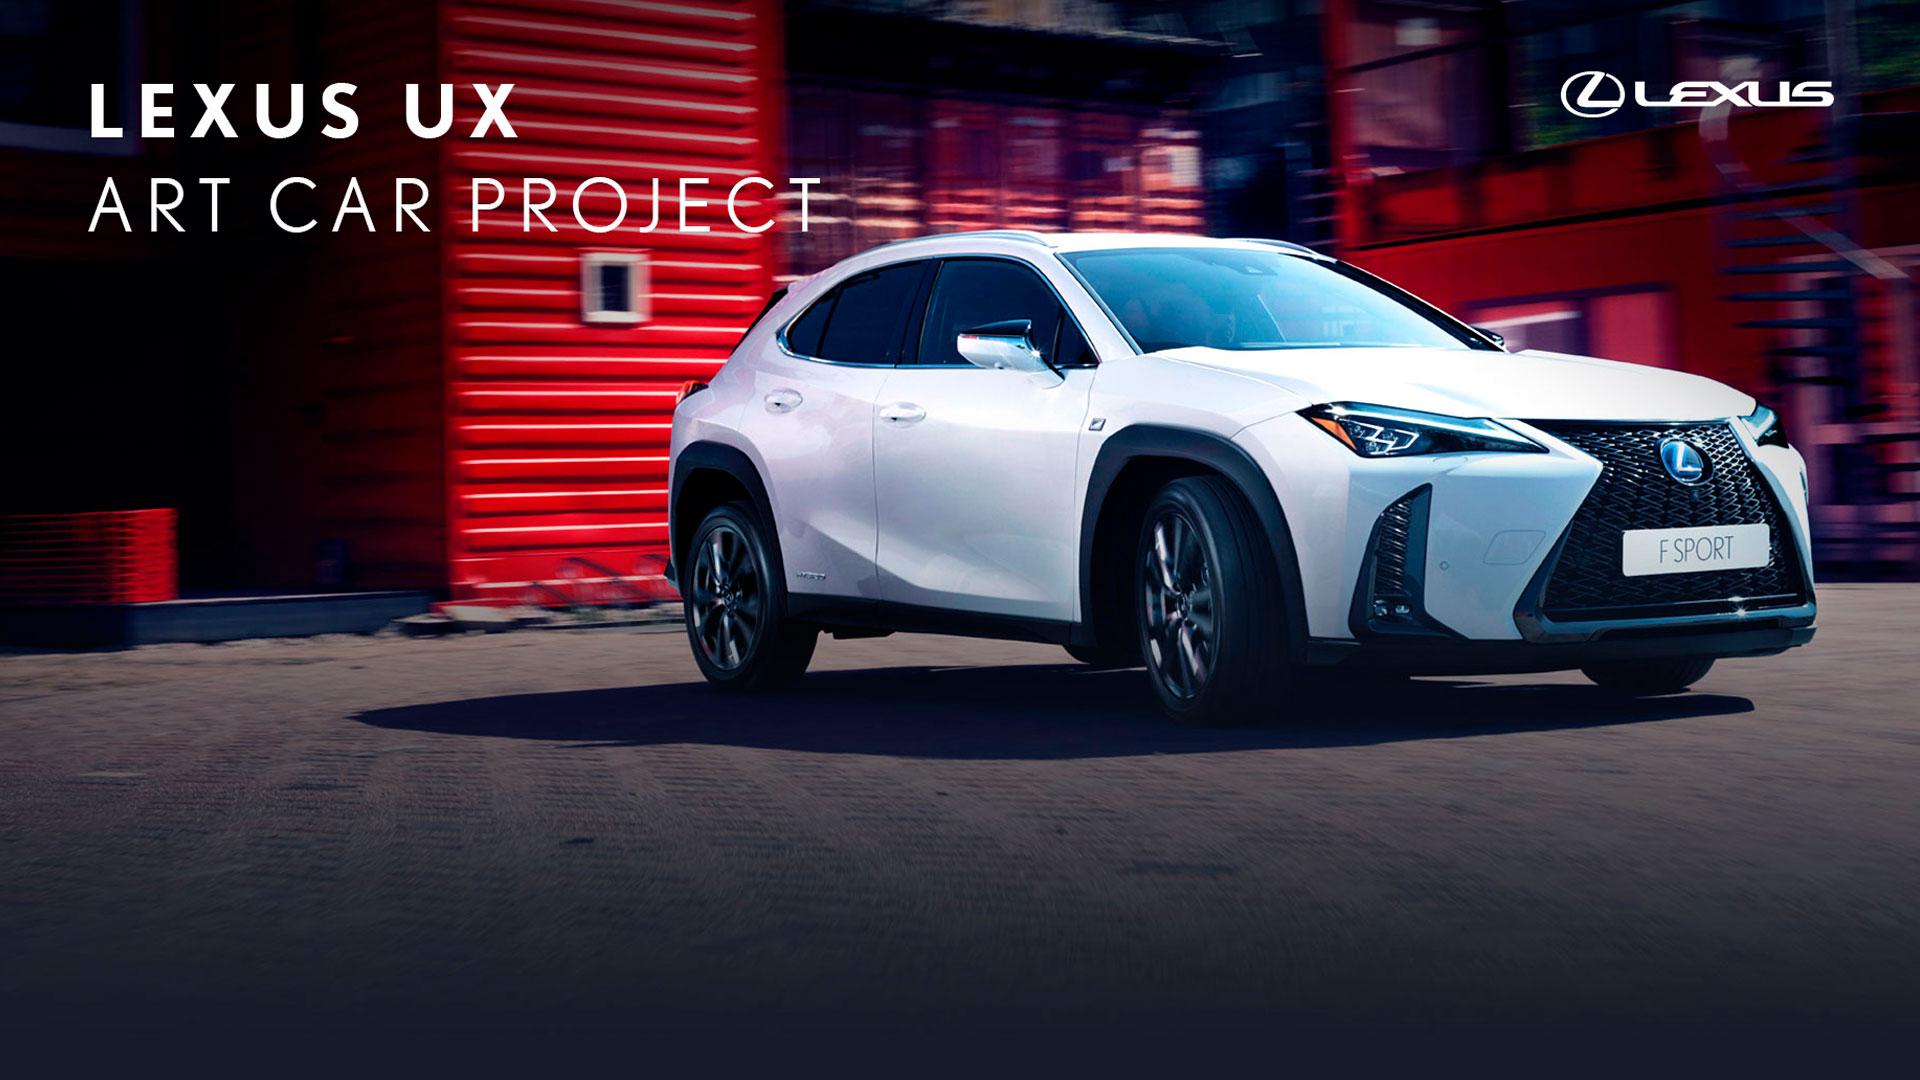 Imagen del concurso Lexus Art Car